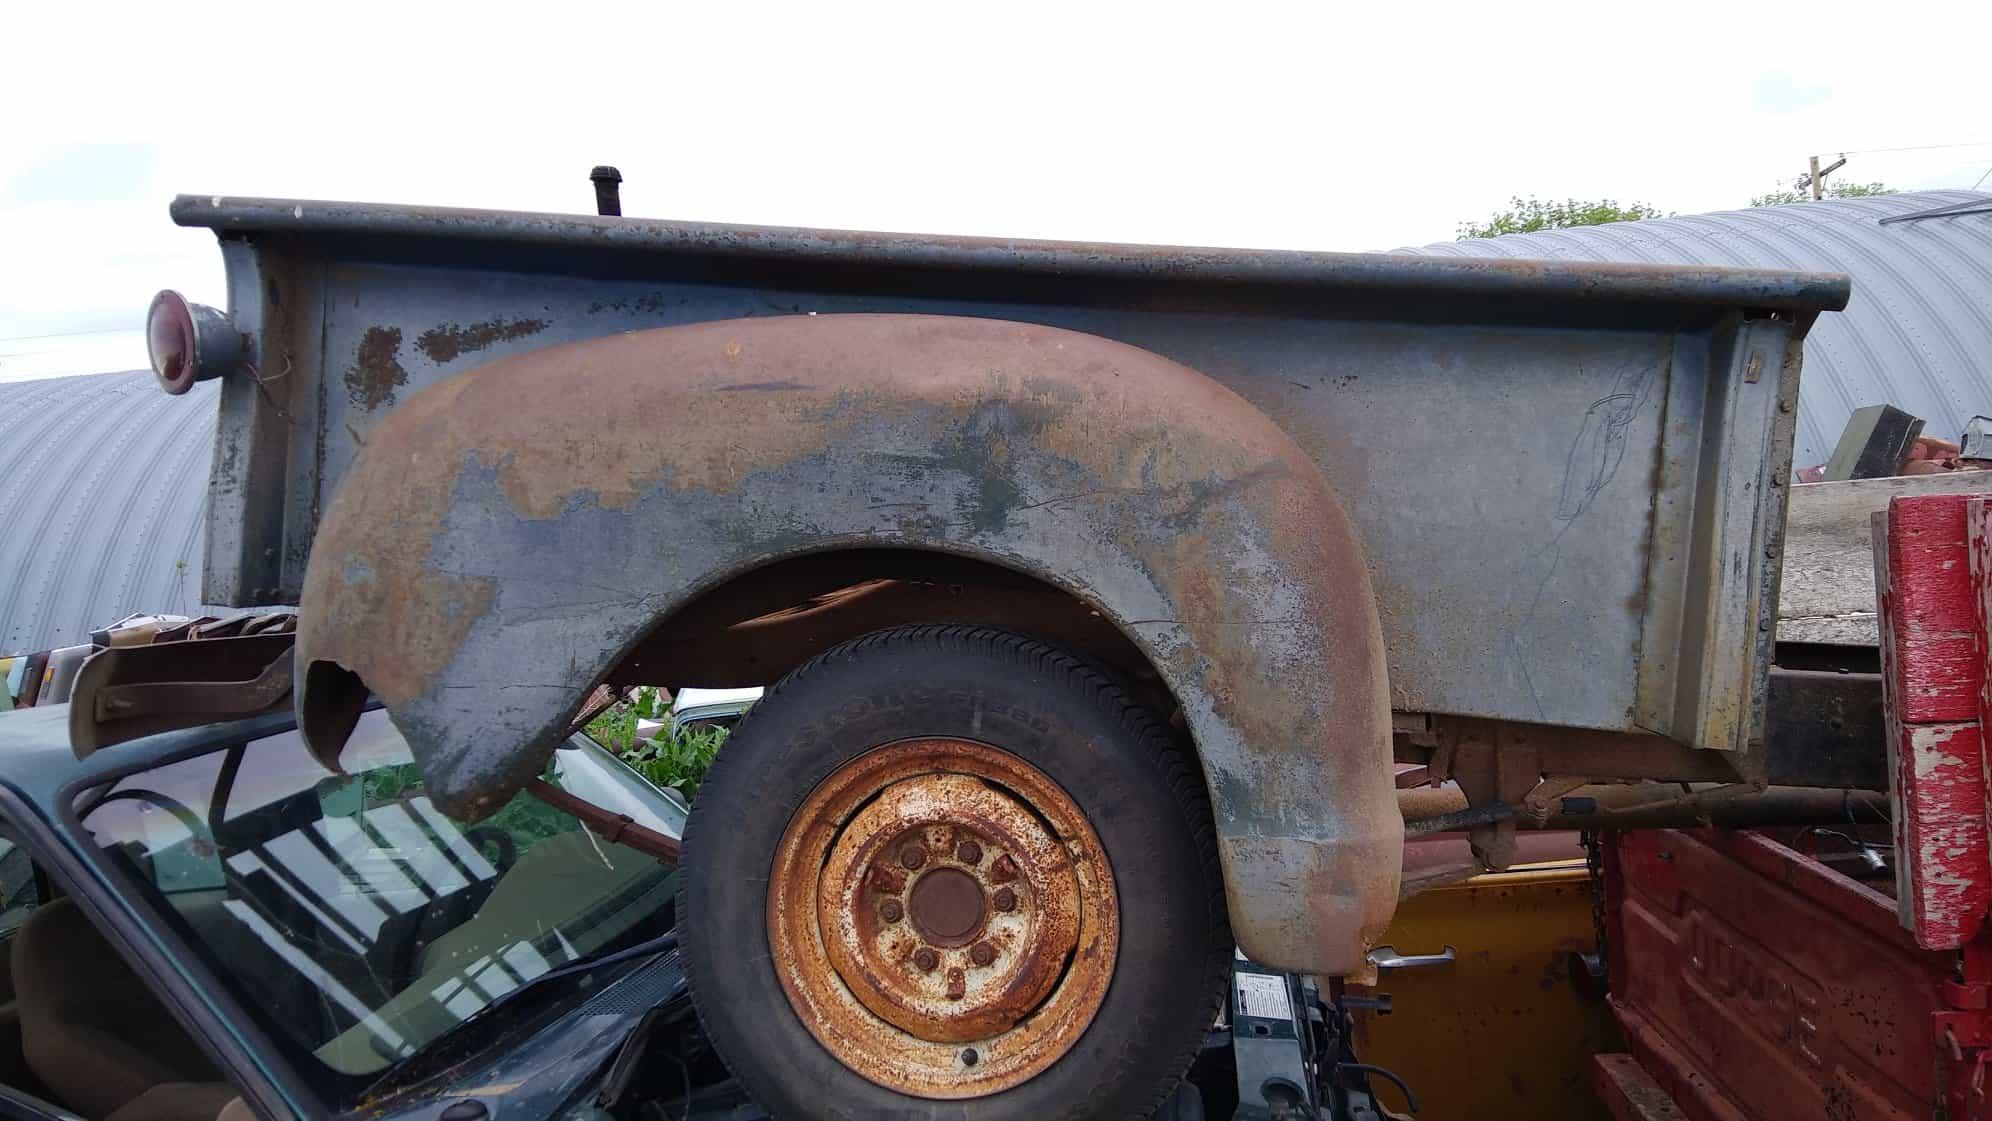 Classic Truck Beds For Sale in Harvard, Nebraska -10